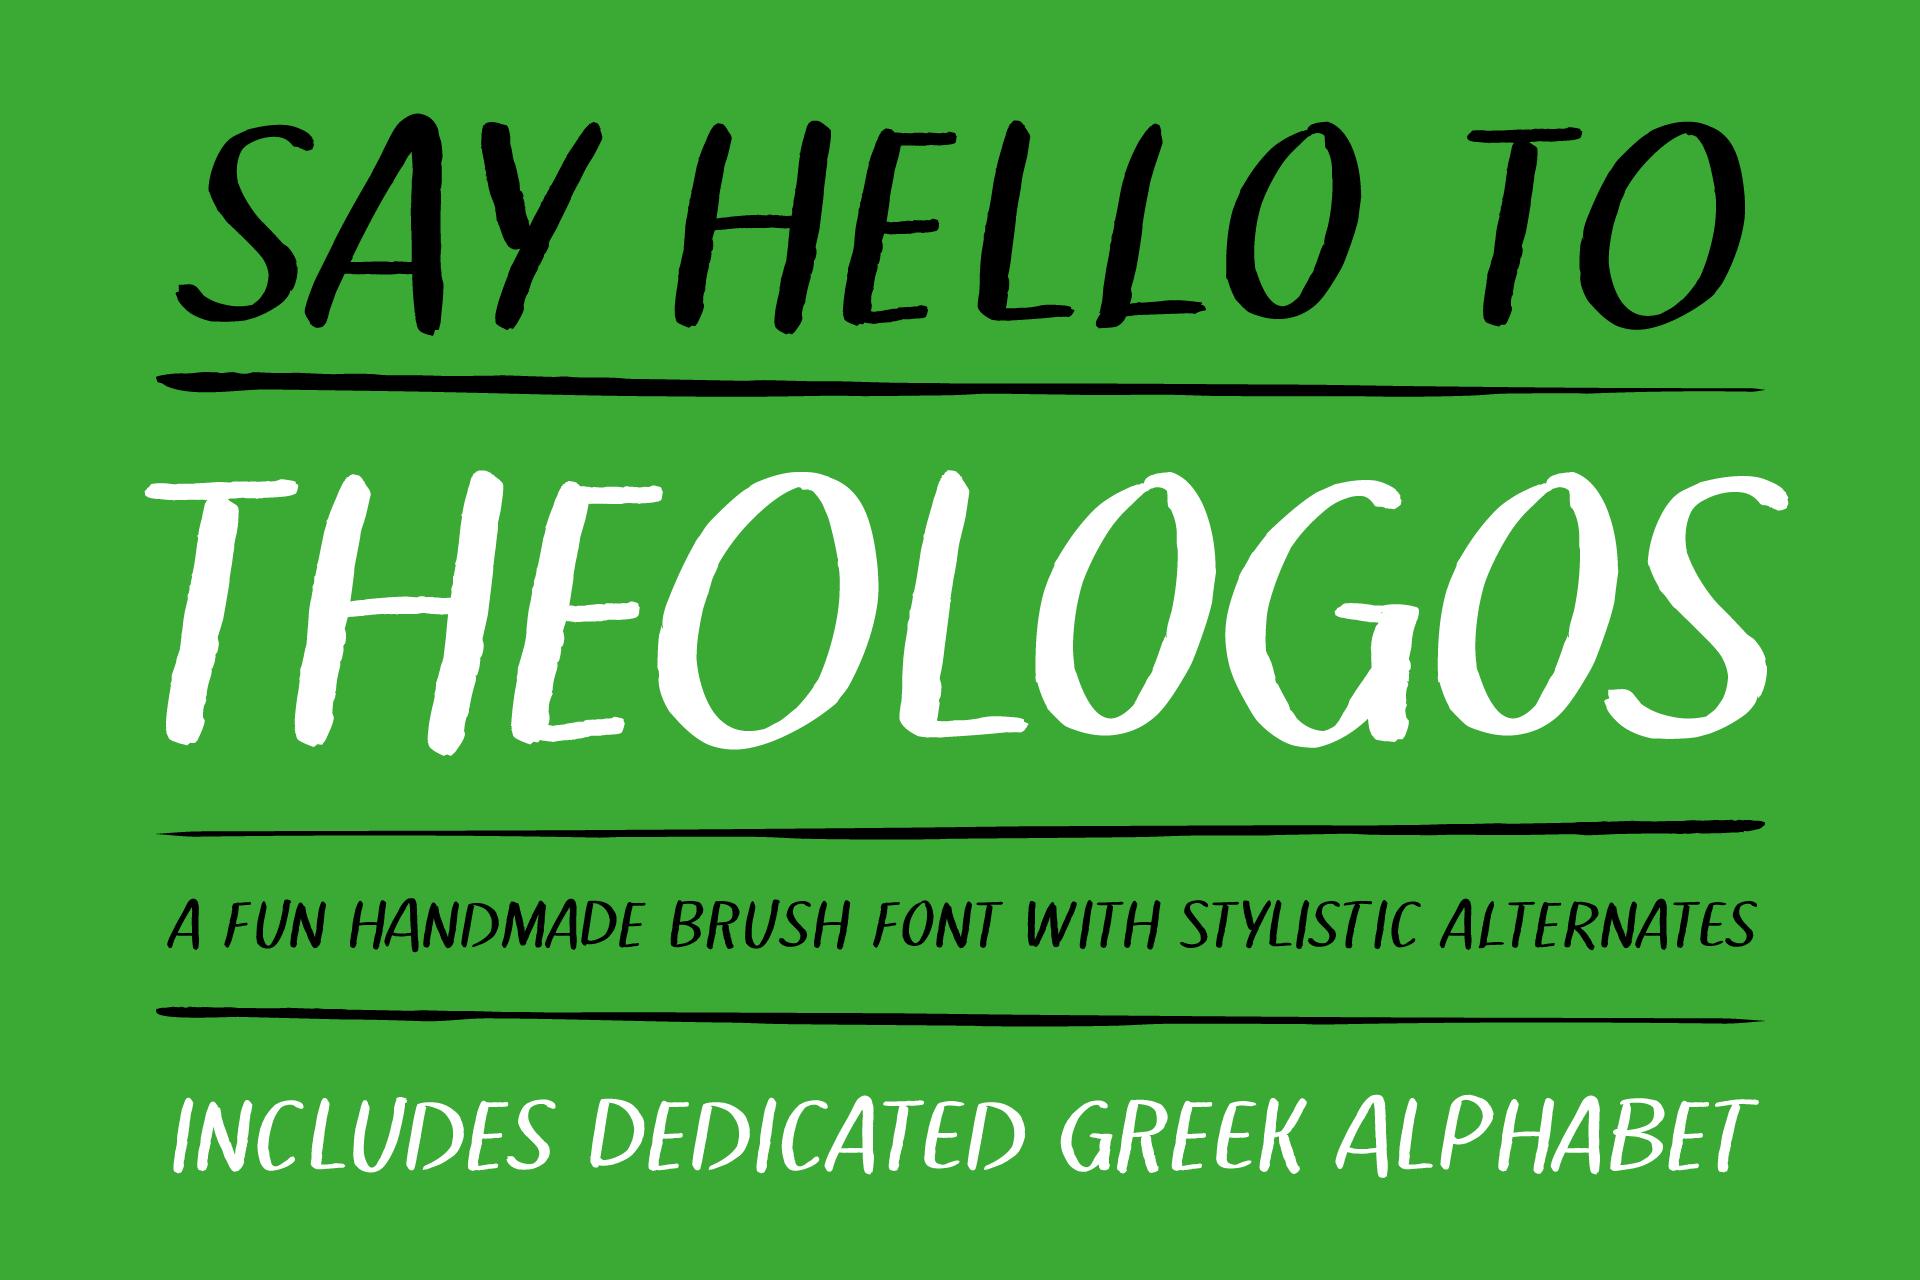 Theologos handmade brush font example image 1